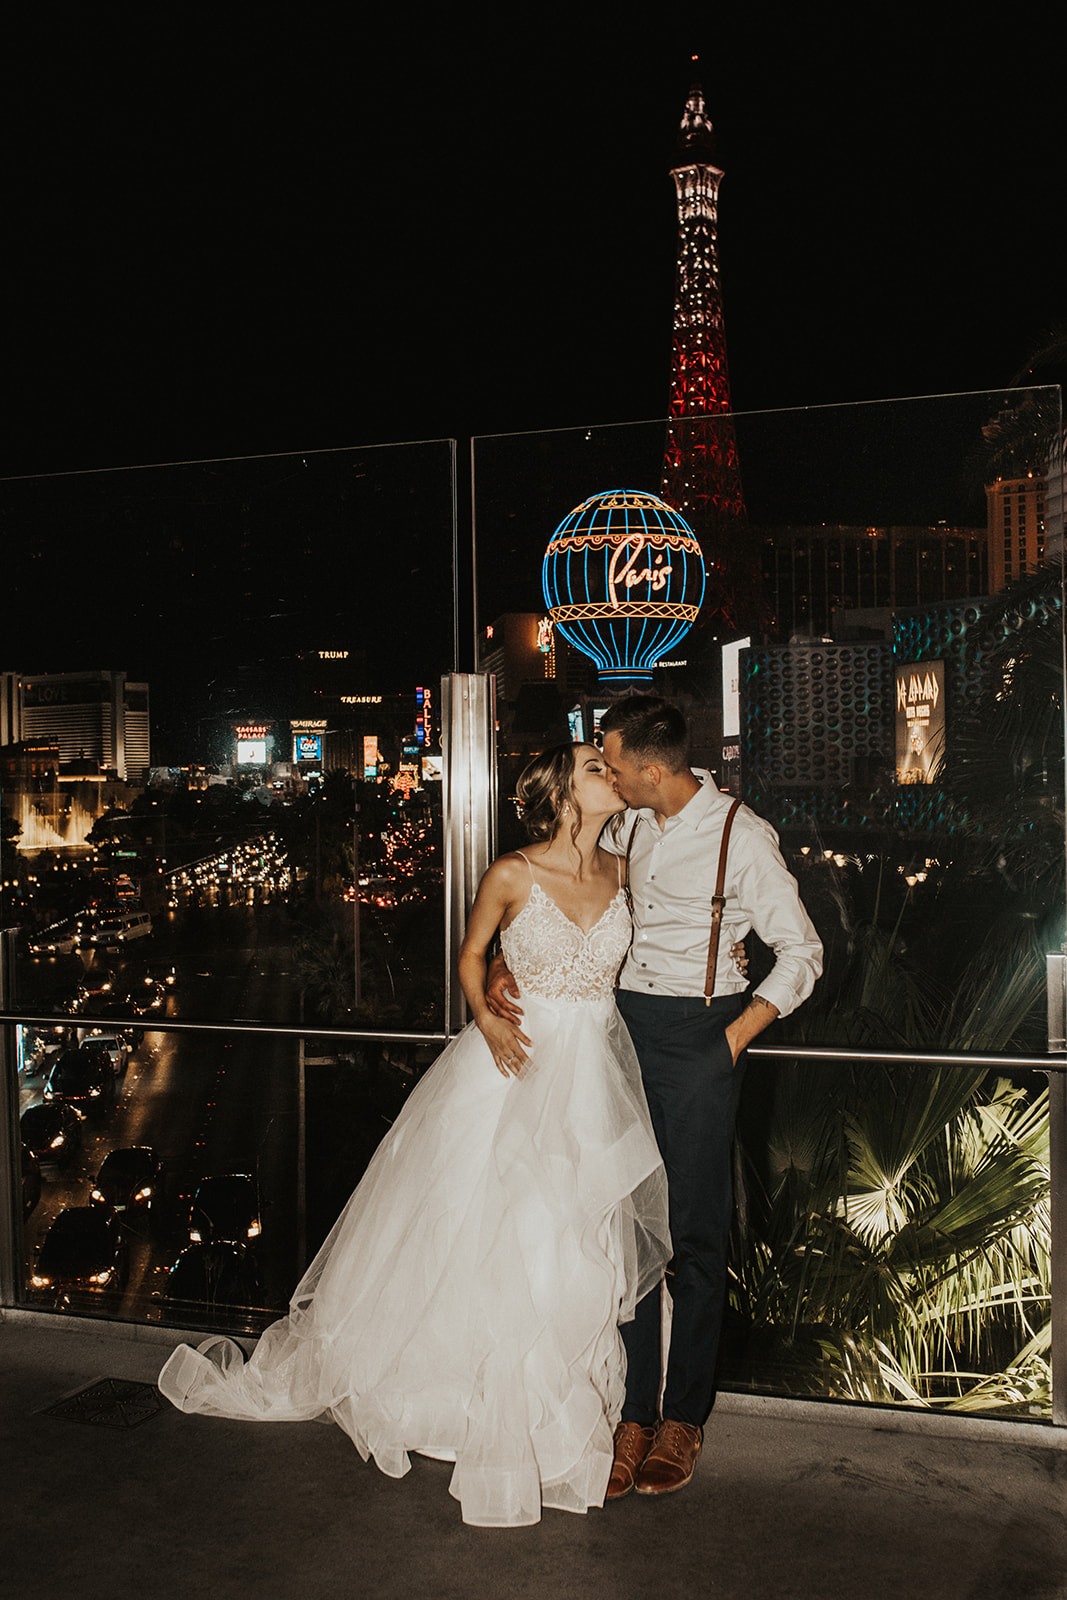 las vegas wedding spokane bride and groom